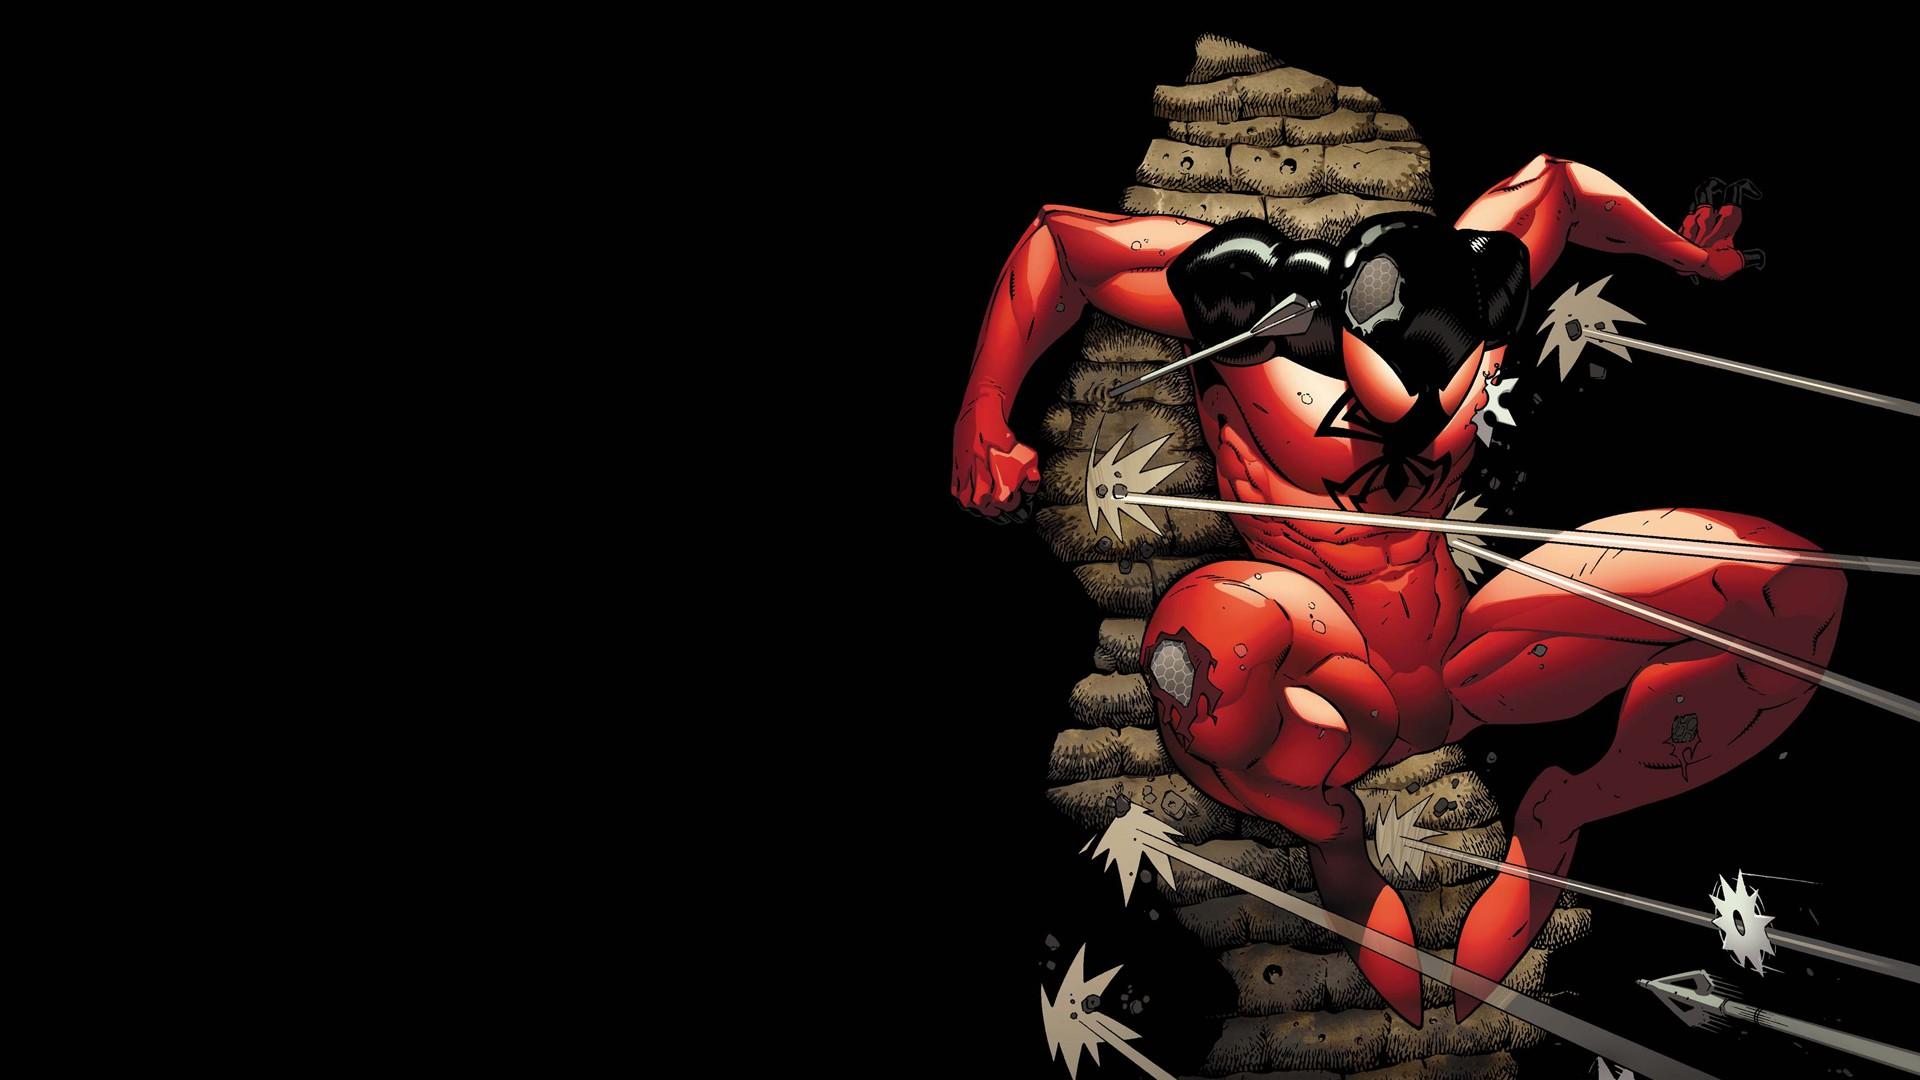 marvel comics wallpaper spider - photo #38